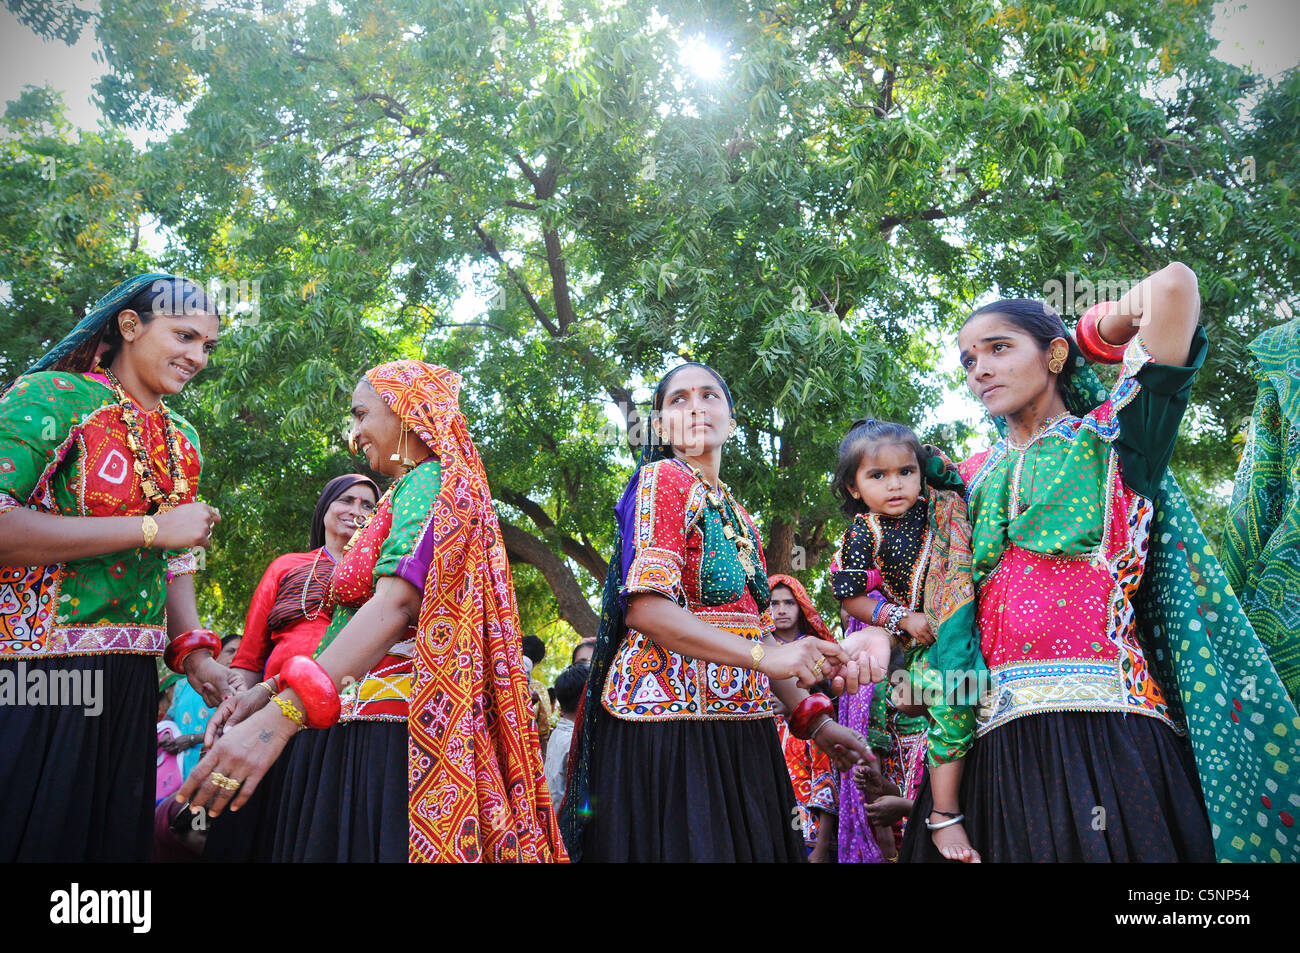 Dhrang, India - Stock Image